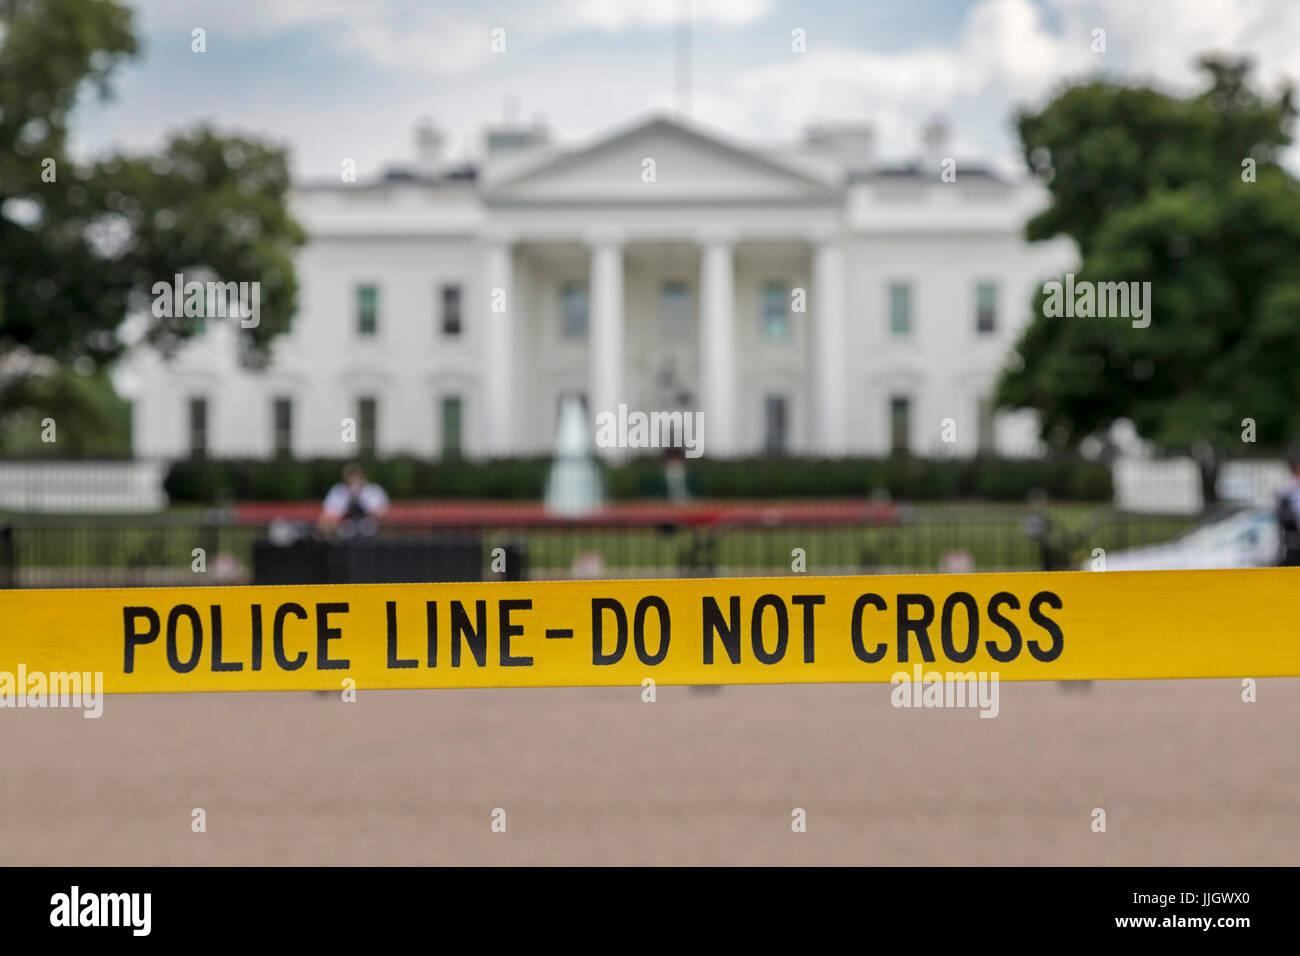 Washington, DC - A police line keeps tourists away from the White House. - Stock Image